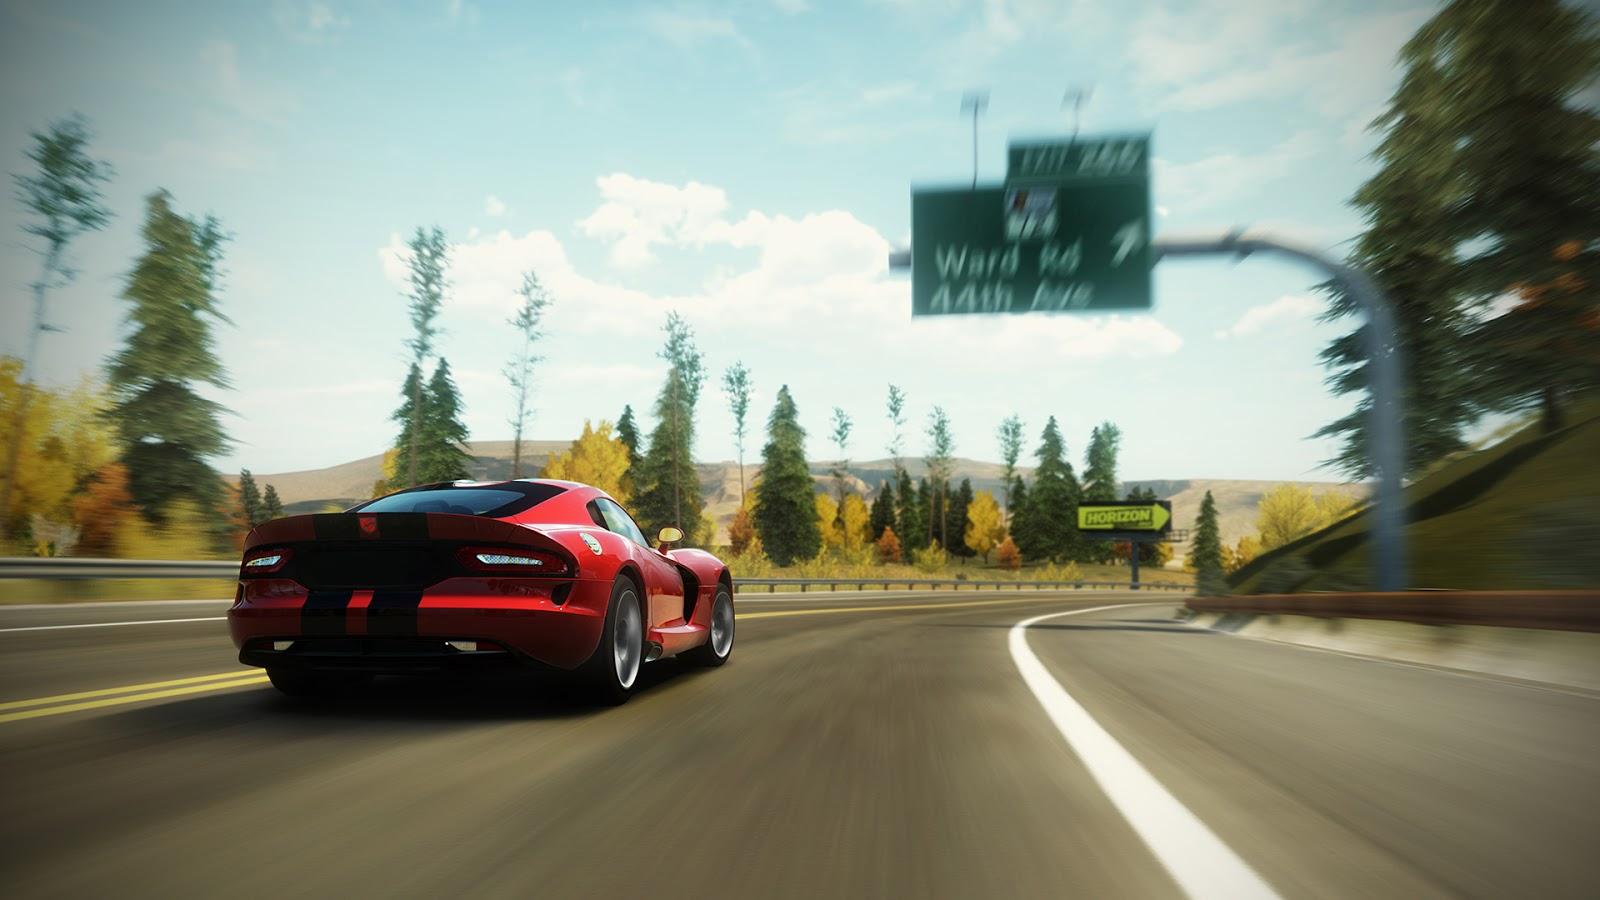 car i Forza Horizon Drops More DLC Packs to Start the New Year